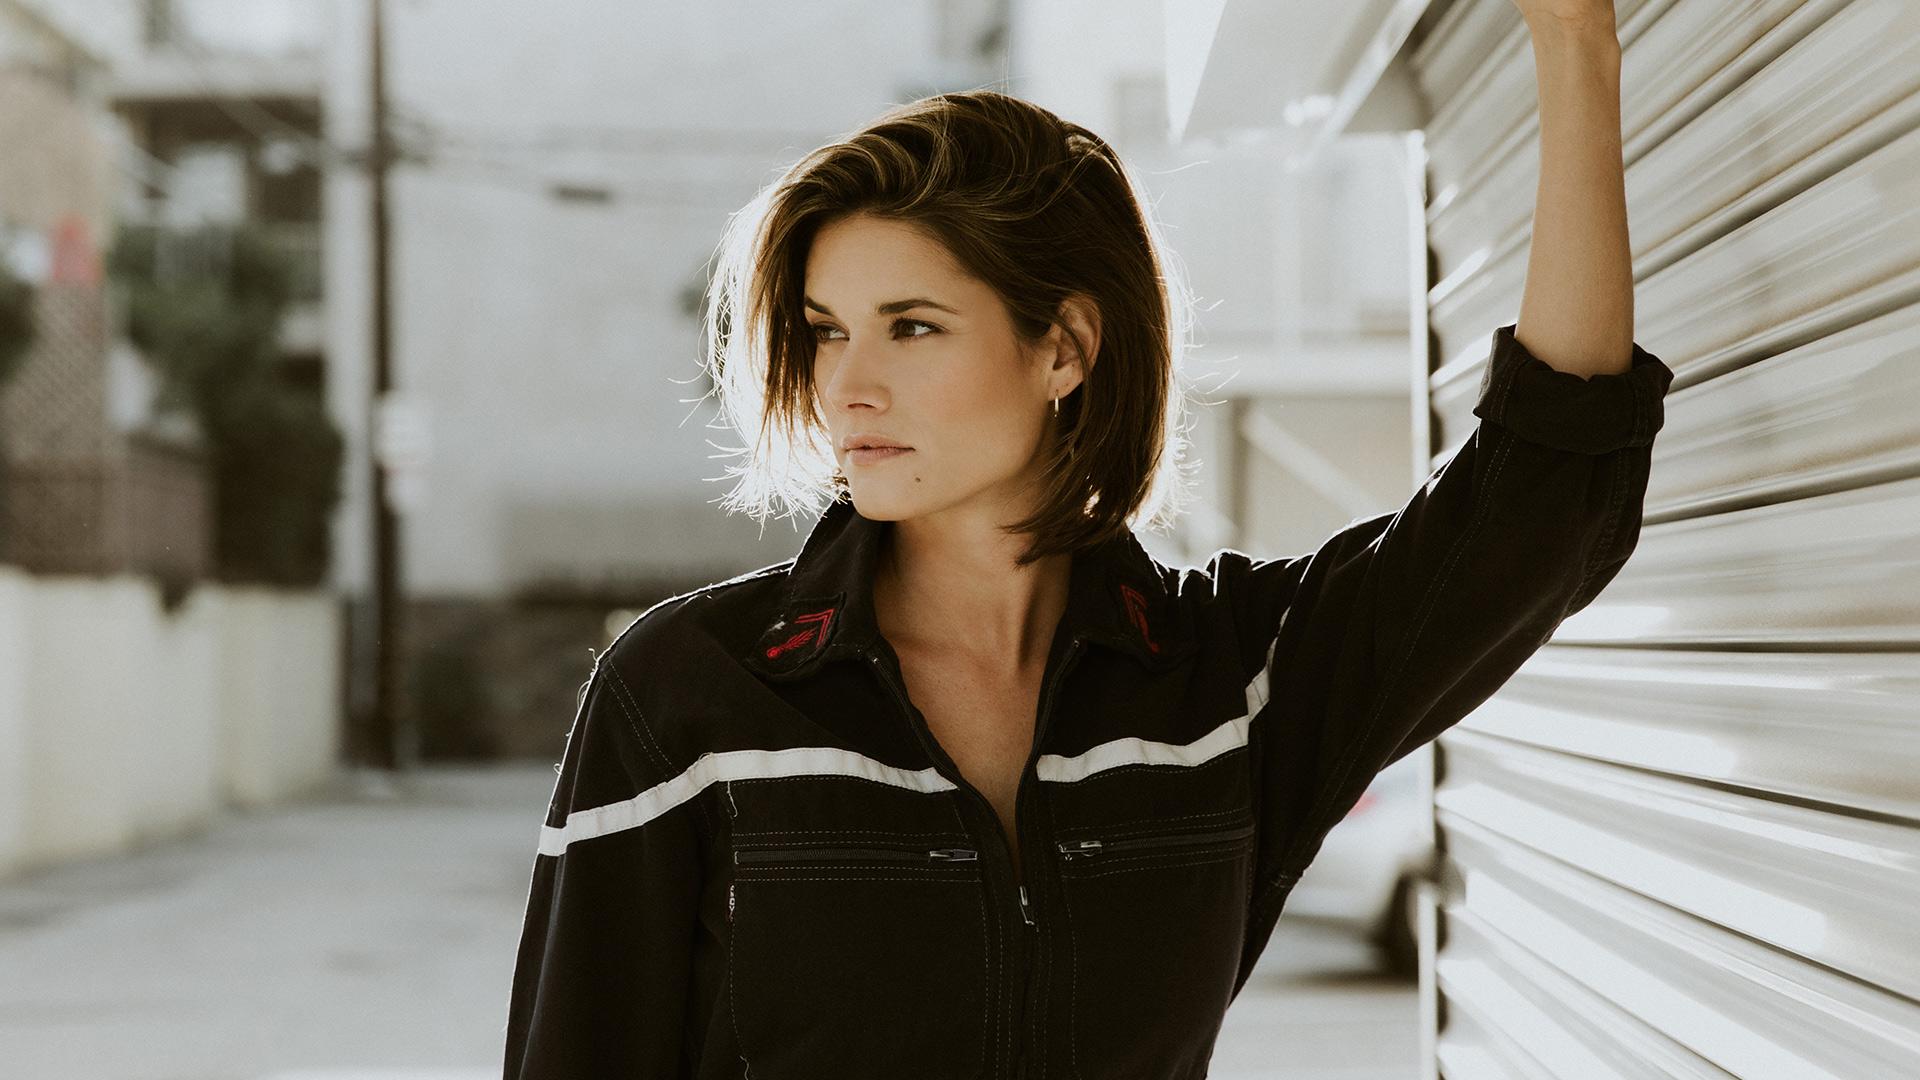 11 Things That FBI Star Missy Peregrym Finds Irresistible